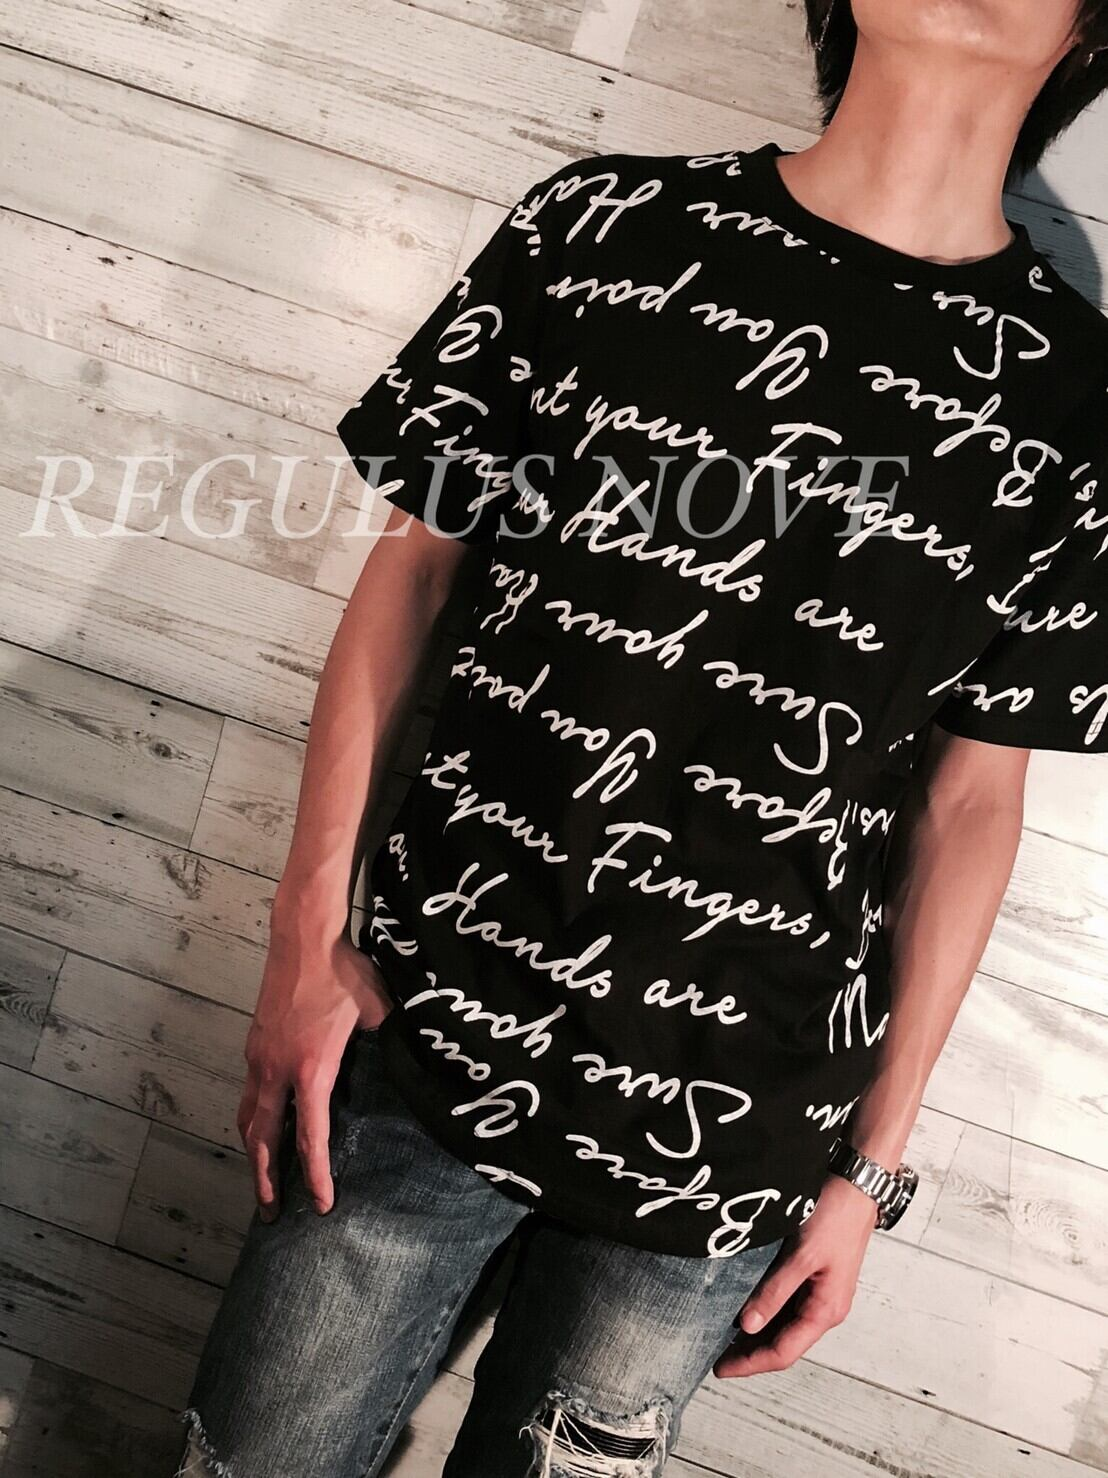 REGULUS NOVE  ランダムメッセージプリントBIGTシャツ BLACK ユニセックス レディース メンズ オーバーサイズ 大きいサイズ 派手 韓国 プリント 個性的 ストリート ロック